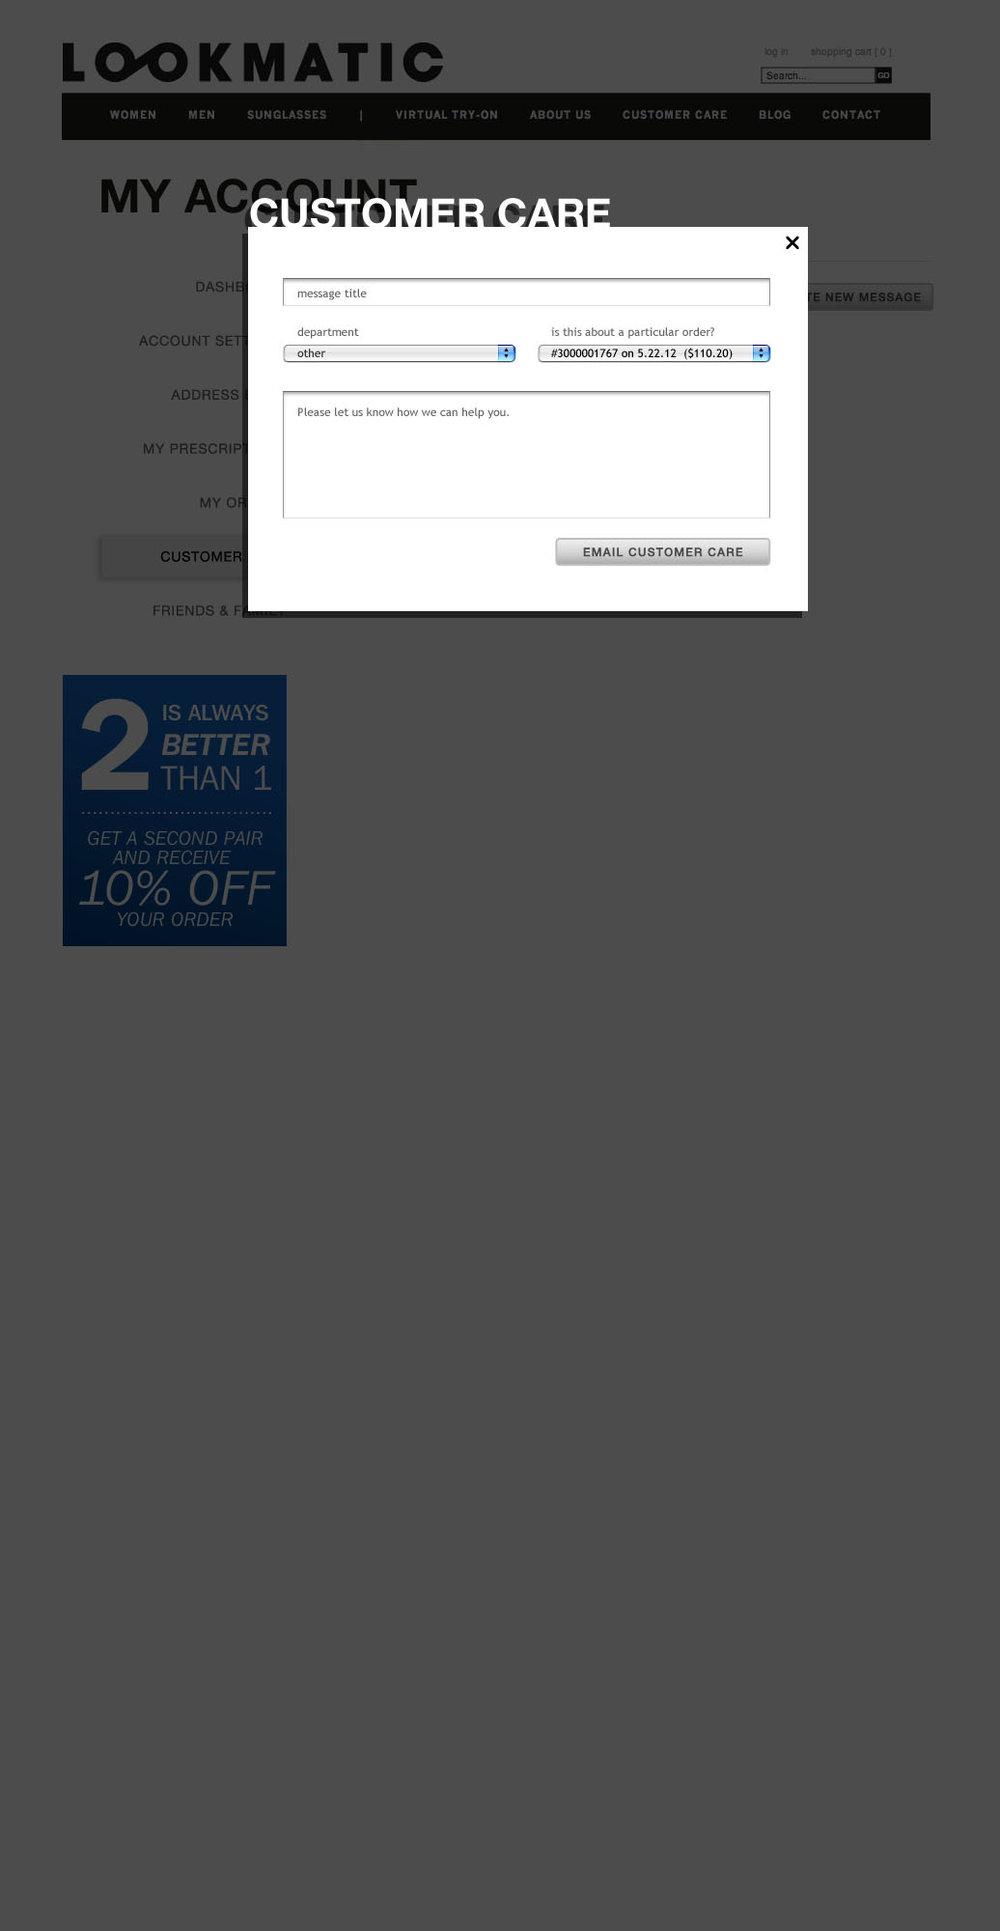 34 - Customer Care (create msg)